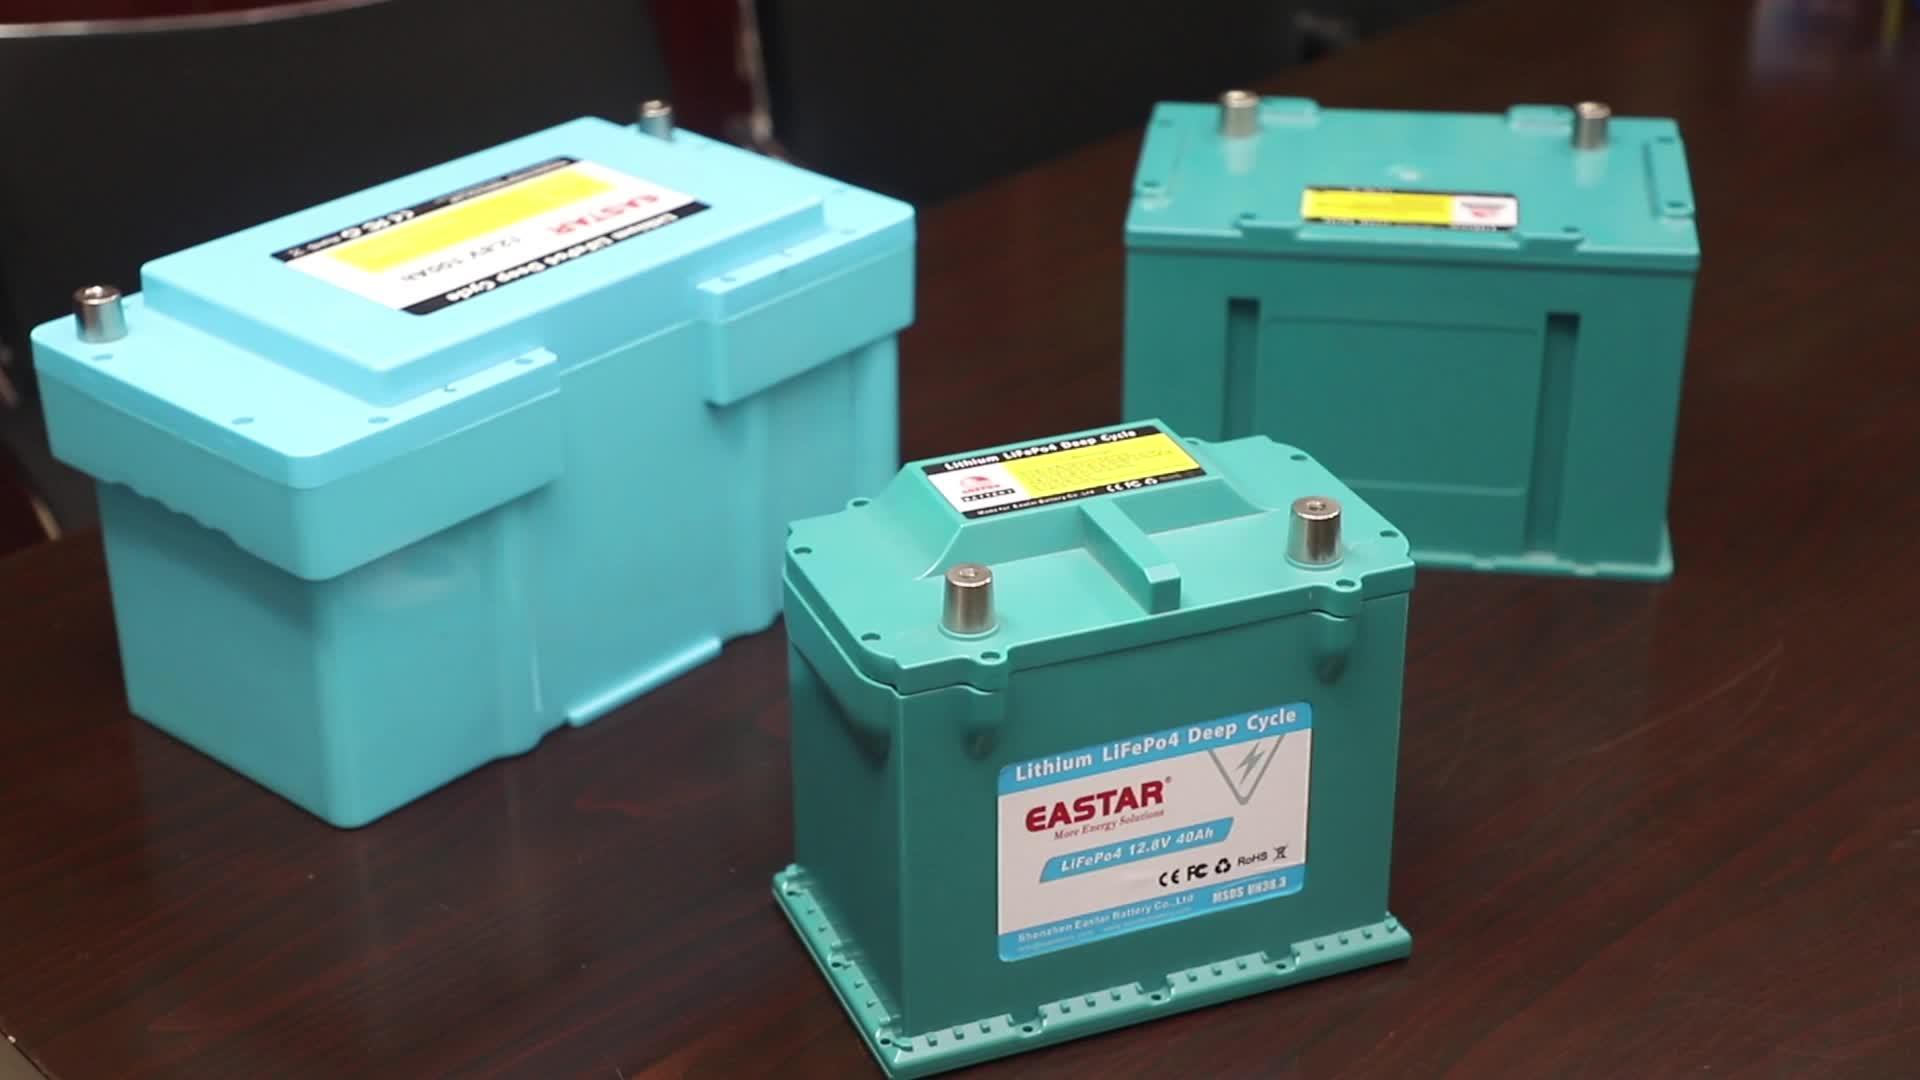 3 Tahun Garansi Isi Ulang Penyimpanan Surya Sistem 12 V 100Ah Baterai Lithium